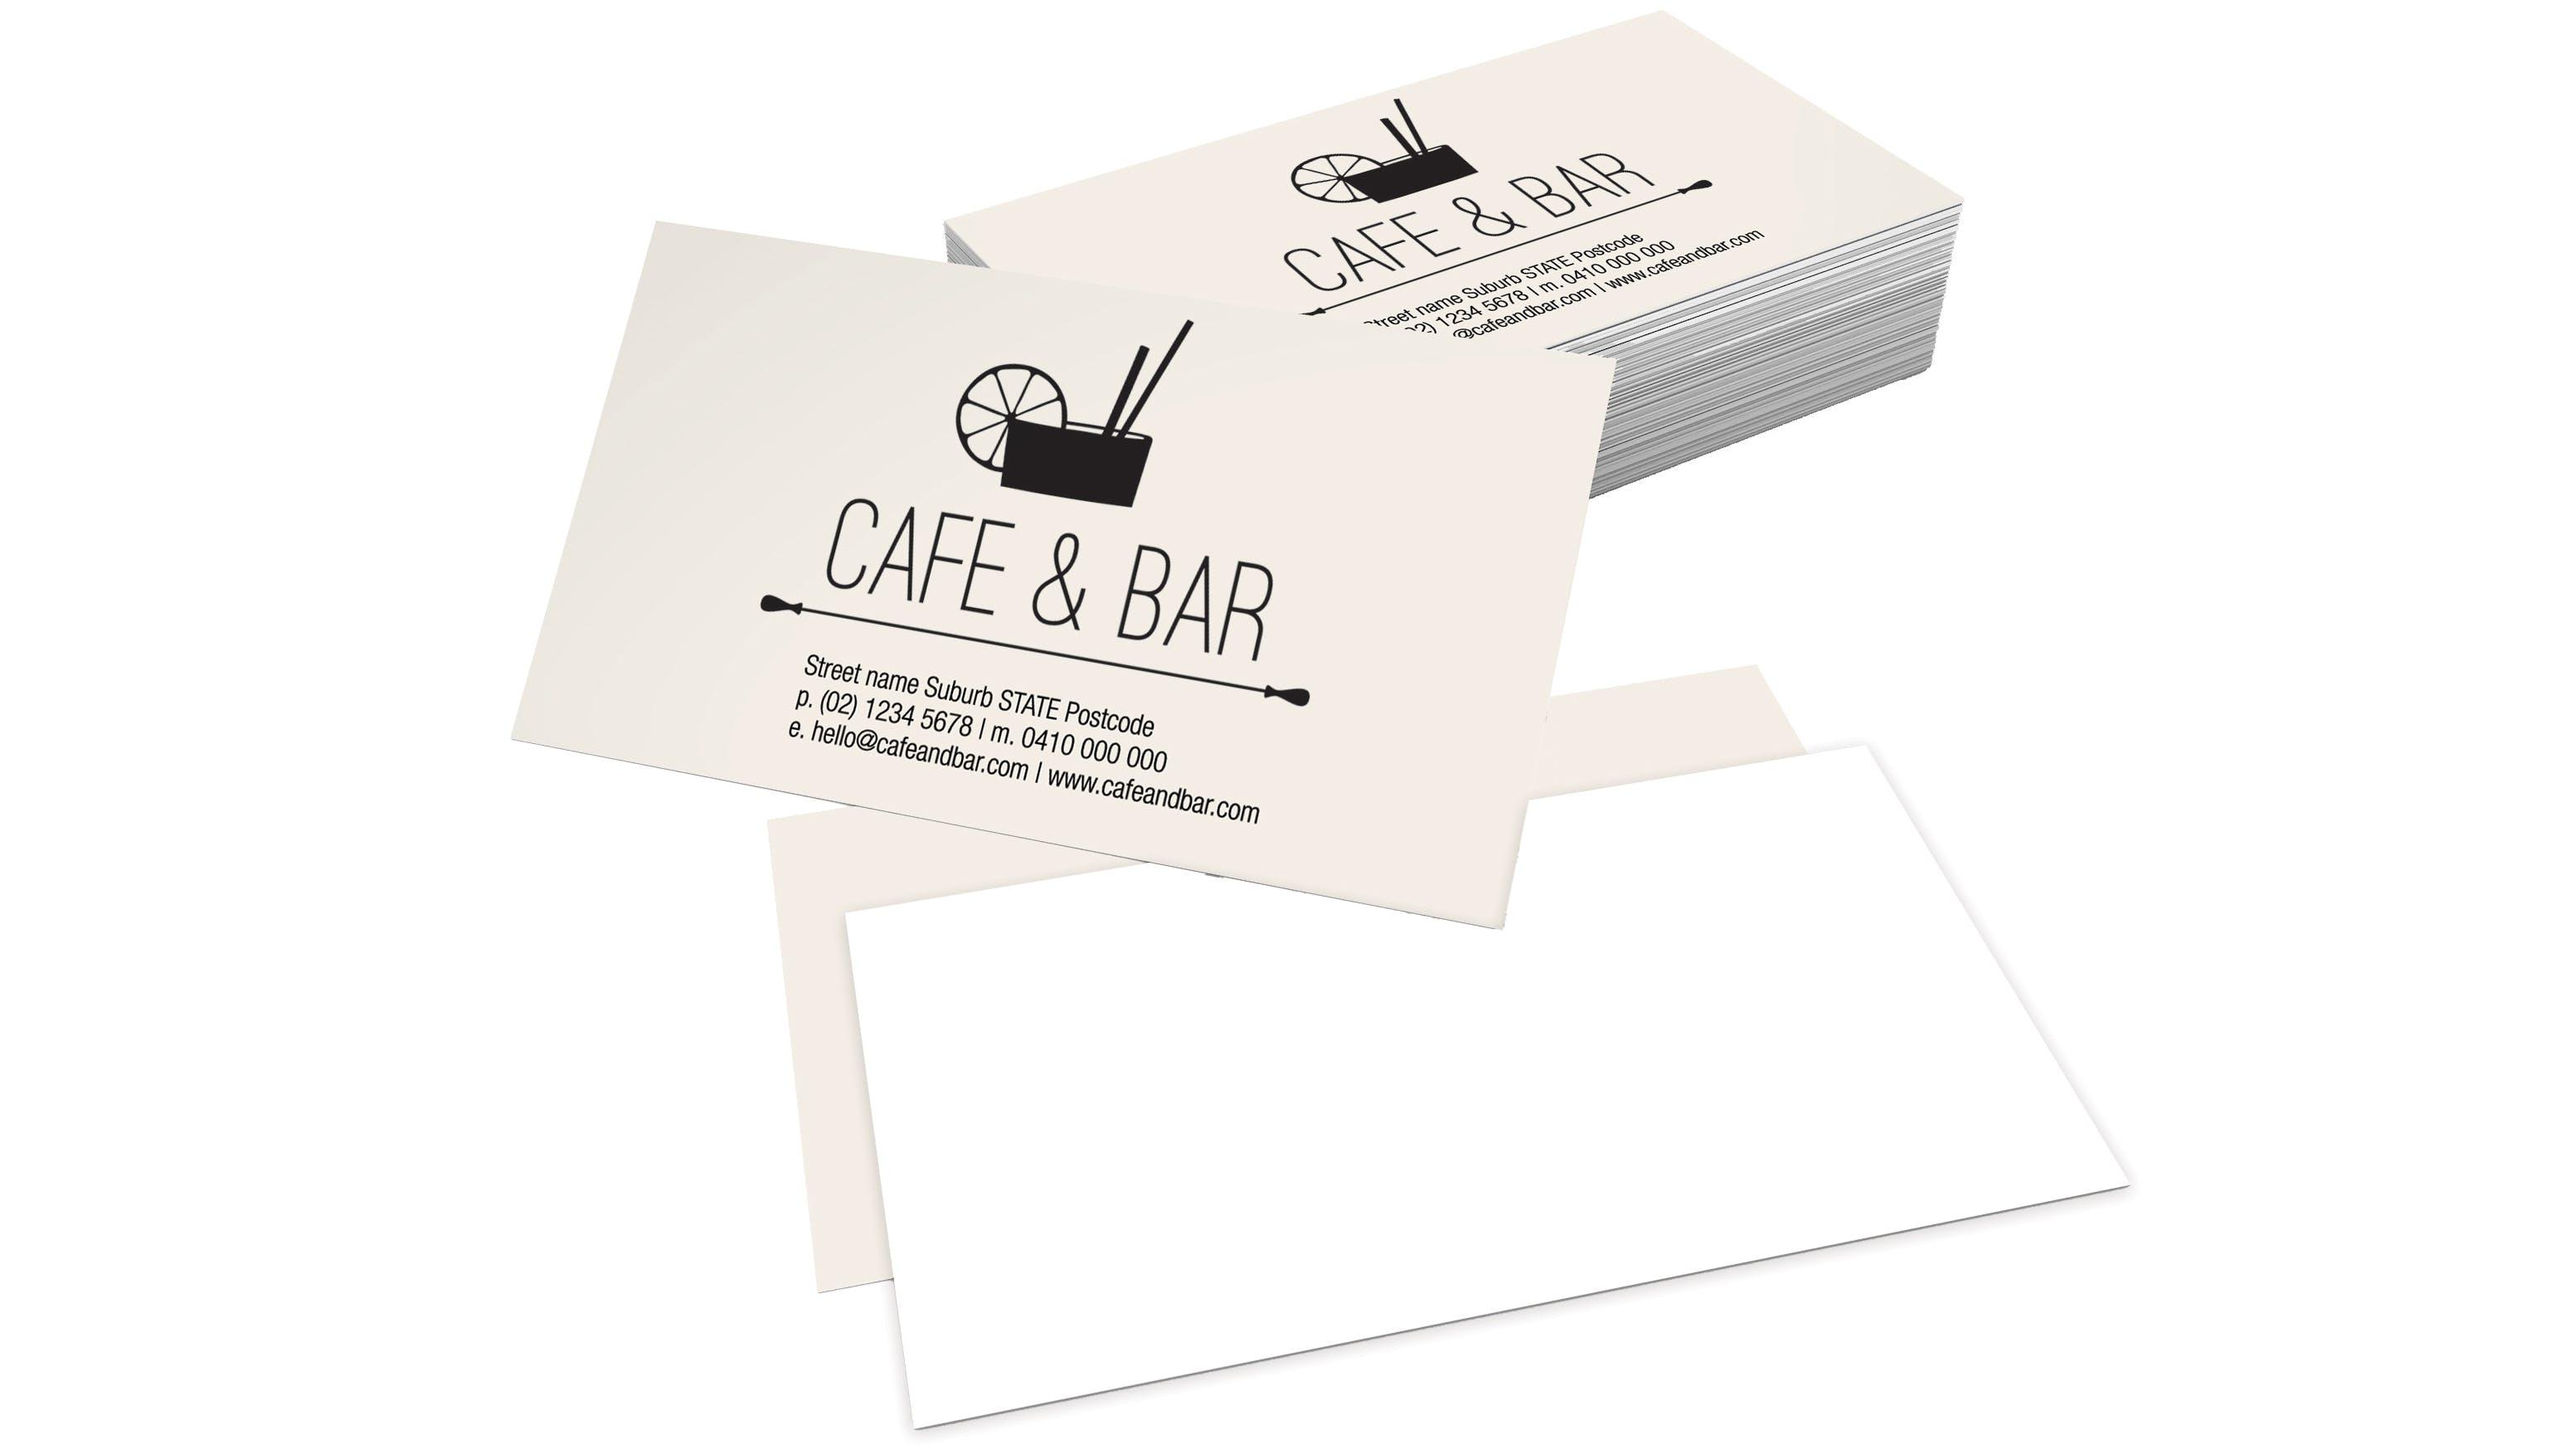 Premium celloglazed business cards single sided 350gsm premium celloglazed business cards single sided 350gsm colourmoves